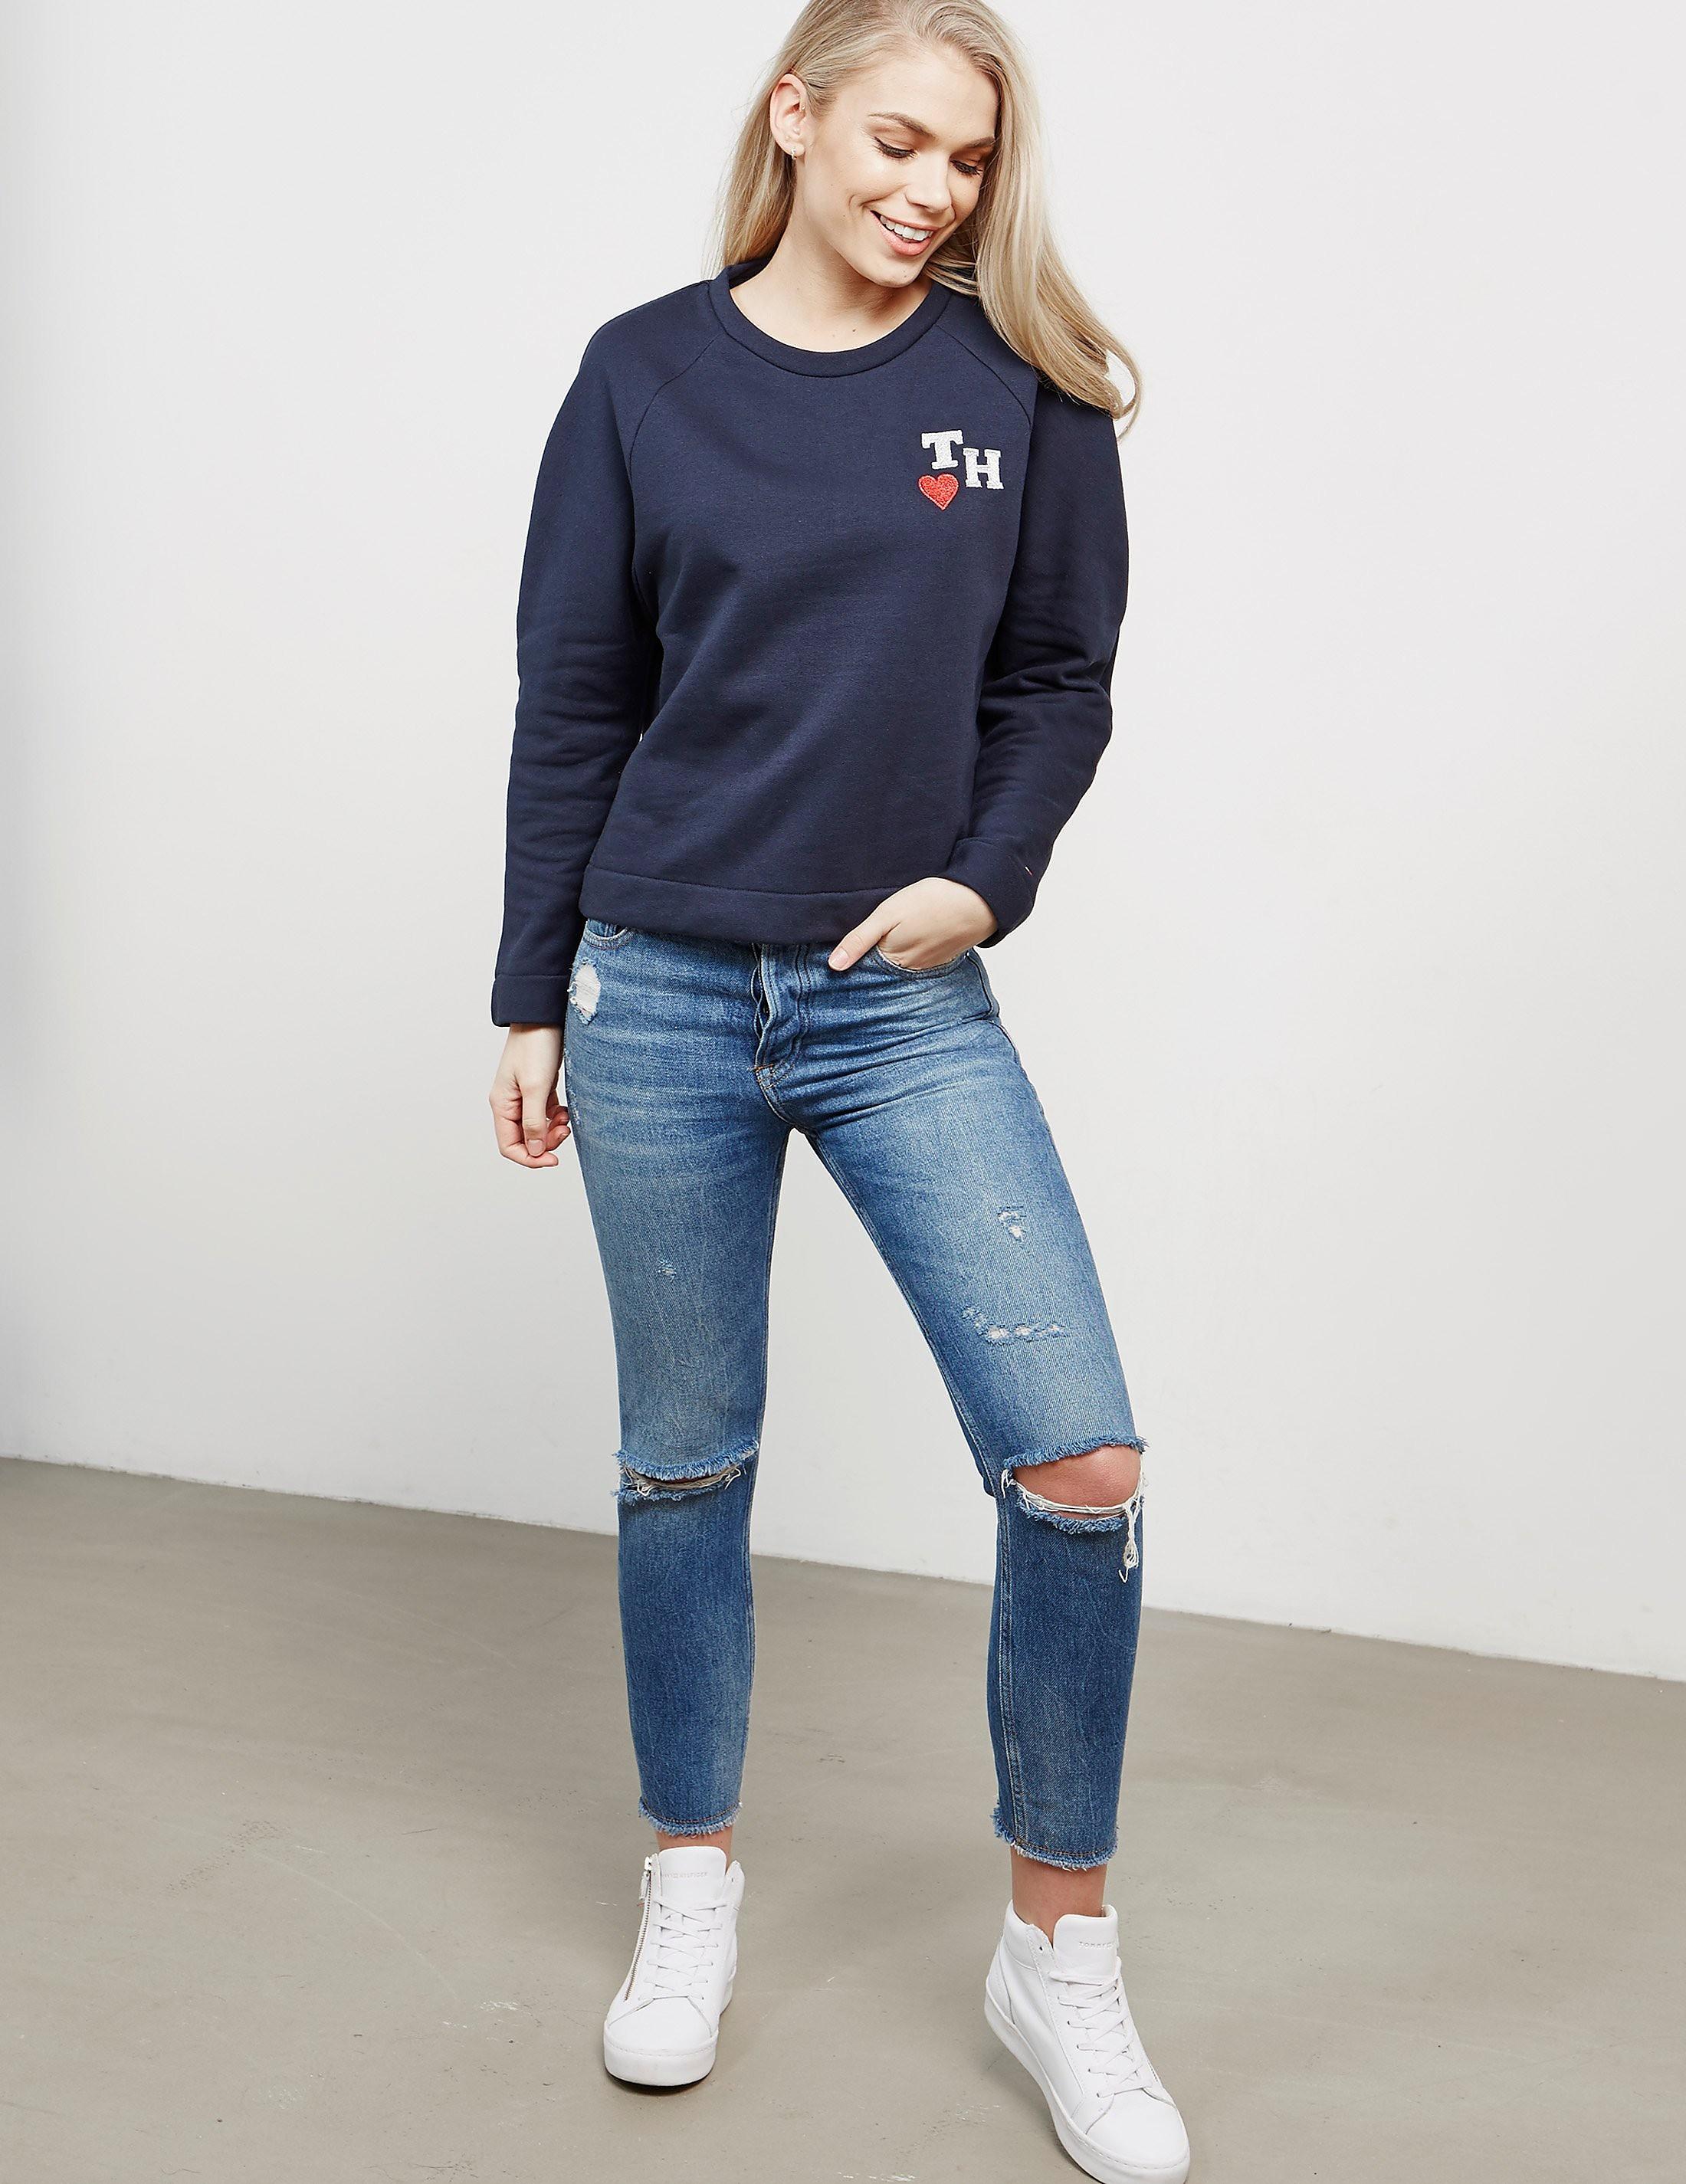 Tommy Hilfiger Glitter Embroidered Heart Sweatshirt